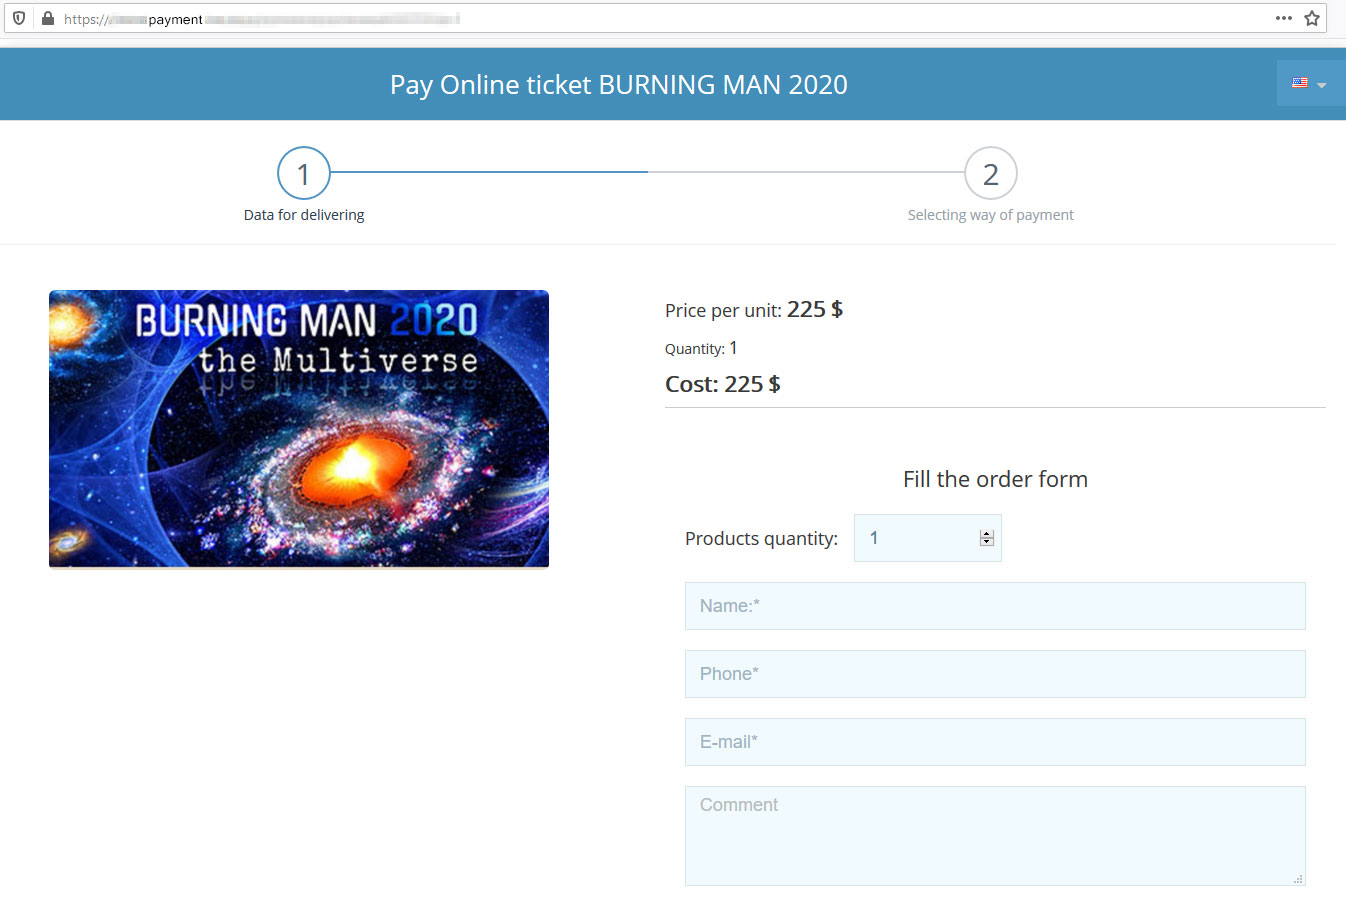 Order form on the fake website